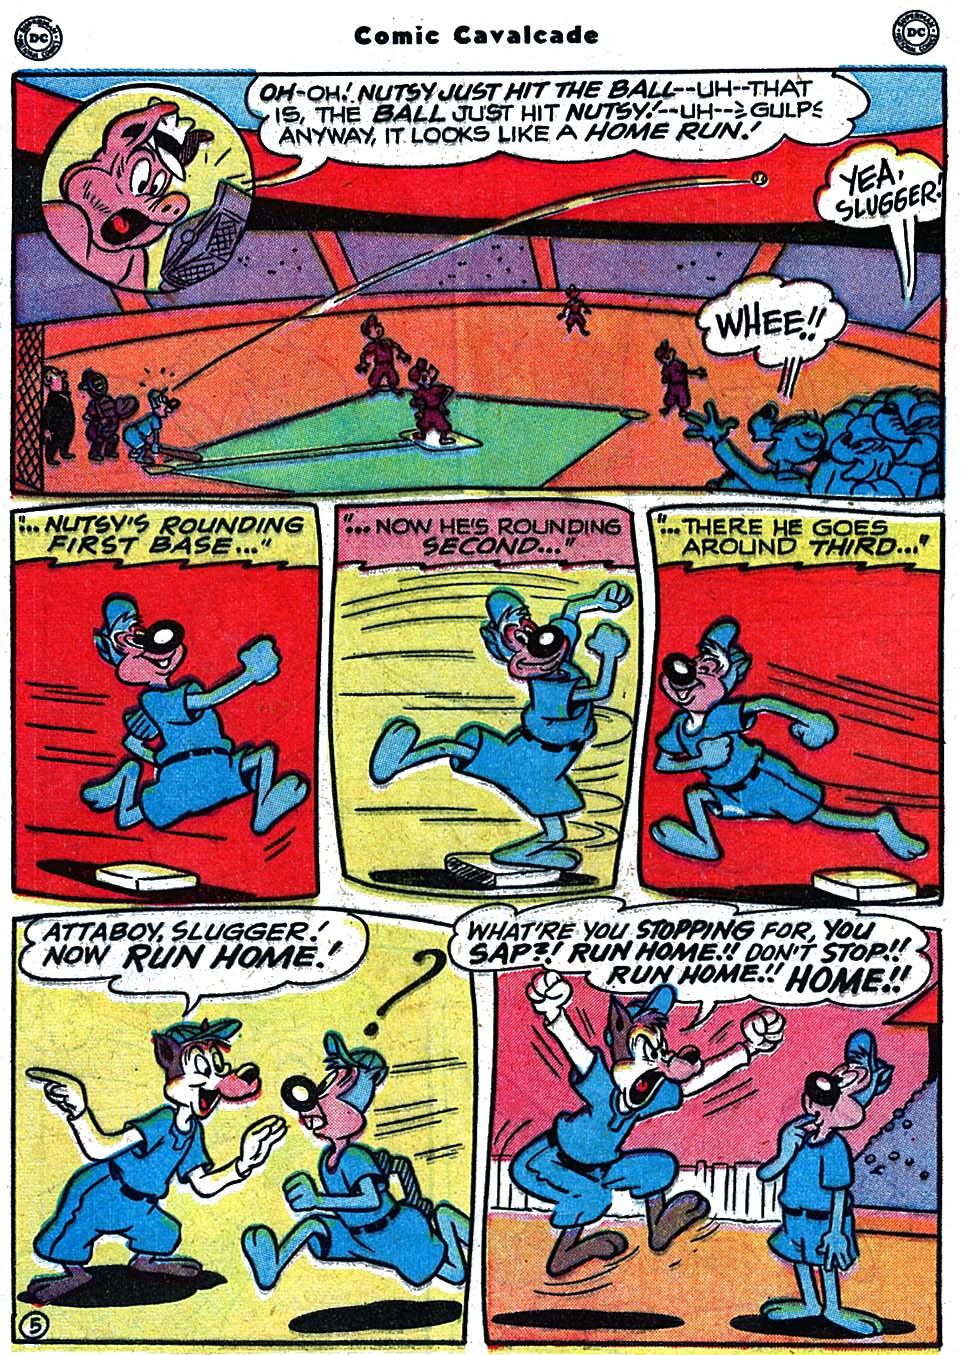 Comic Cavalcade issue 38 - Page 72